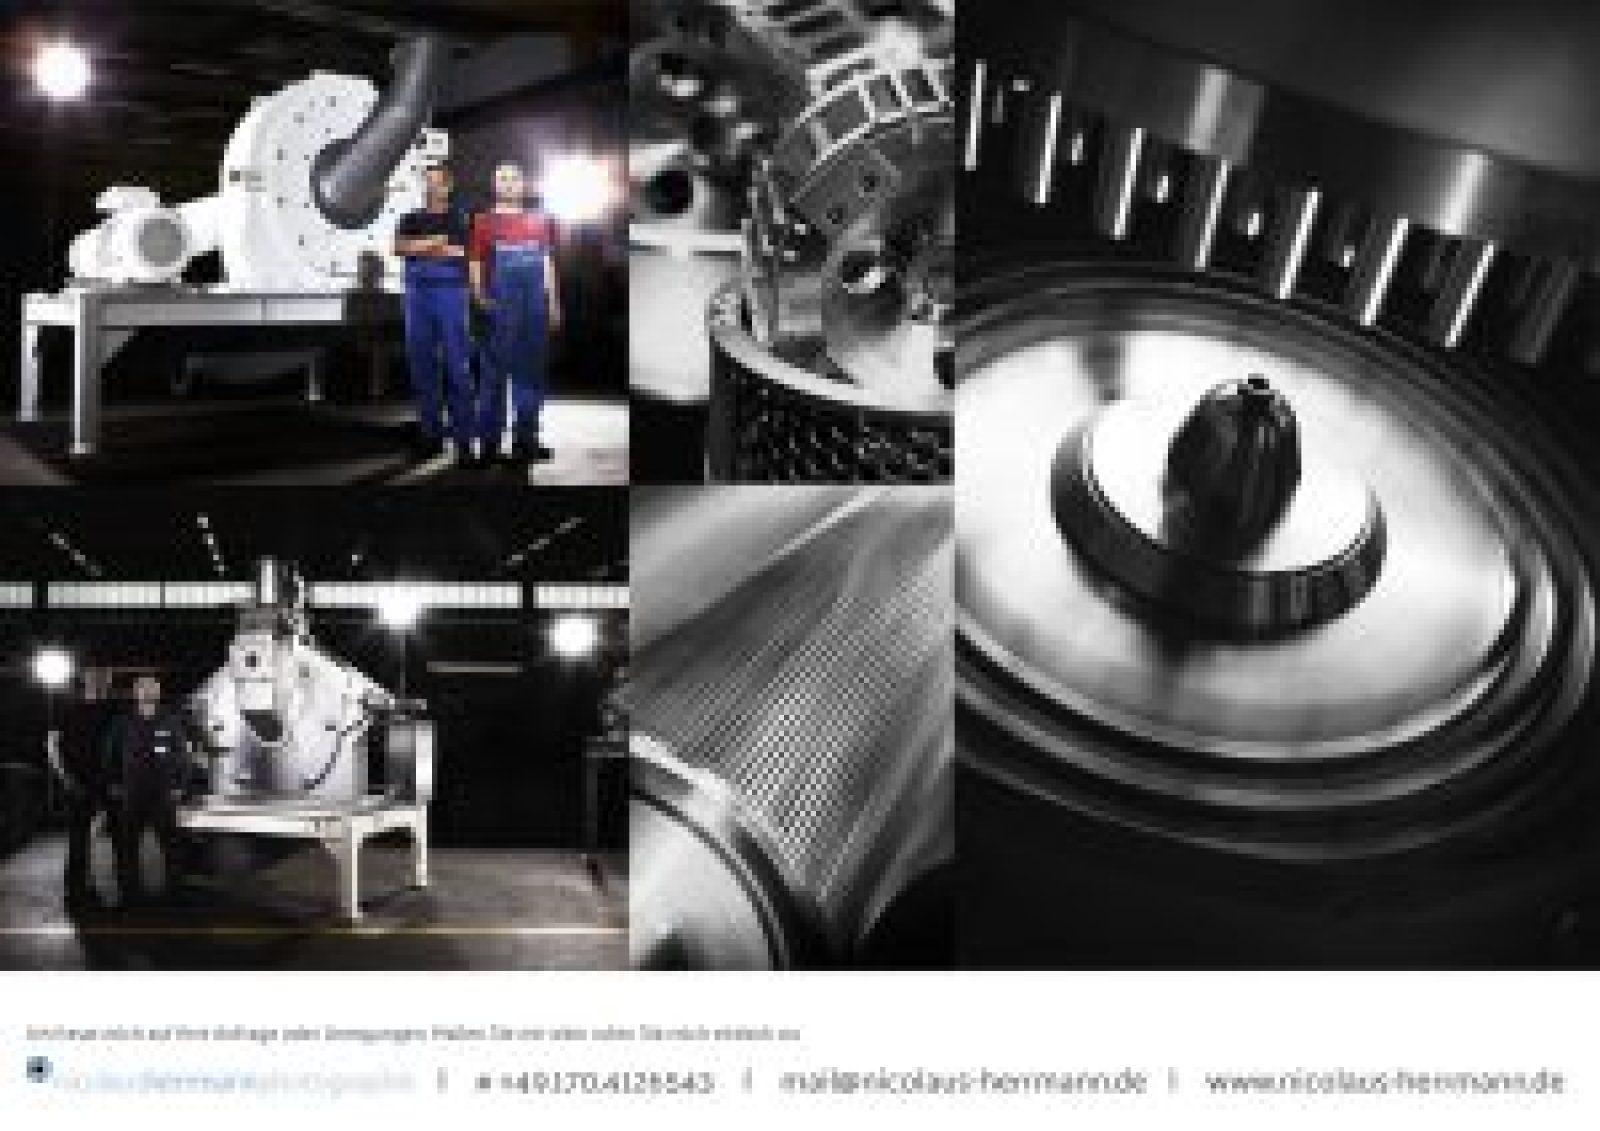 sedcard_industrial_nicolaus herrmann